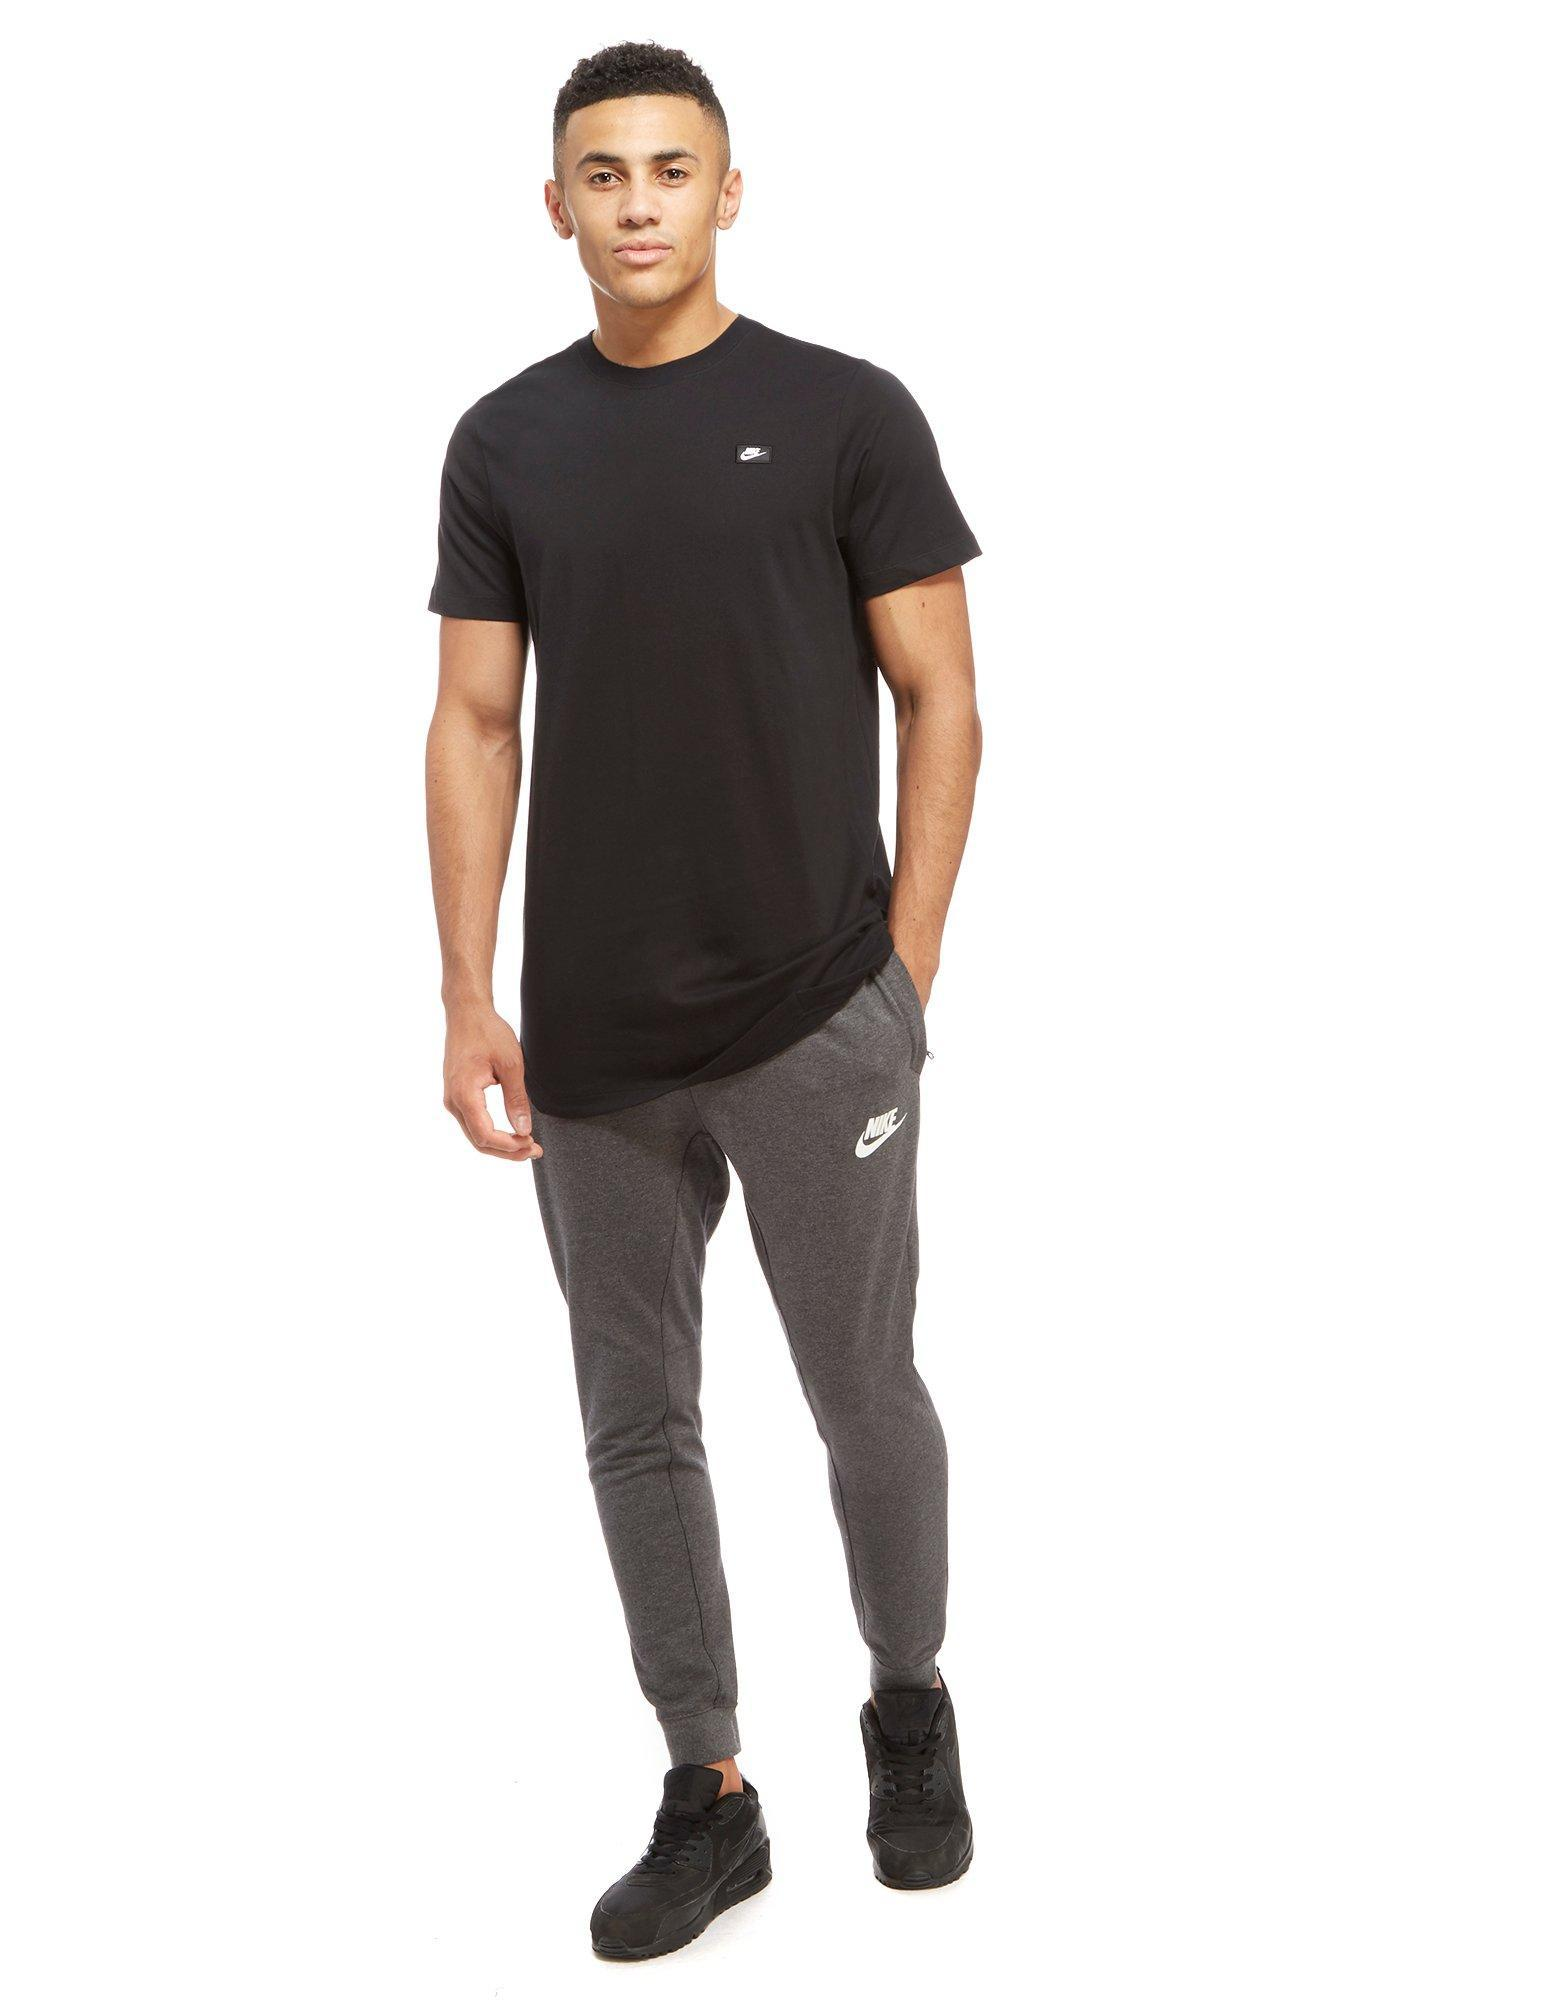 afb5cdd5 Nike Modern Long T-shirt in Black for Men - Lyst